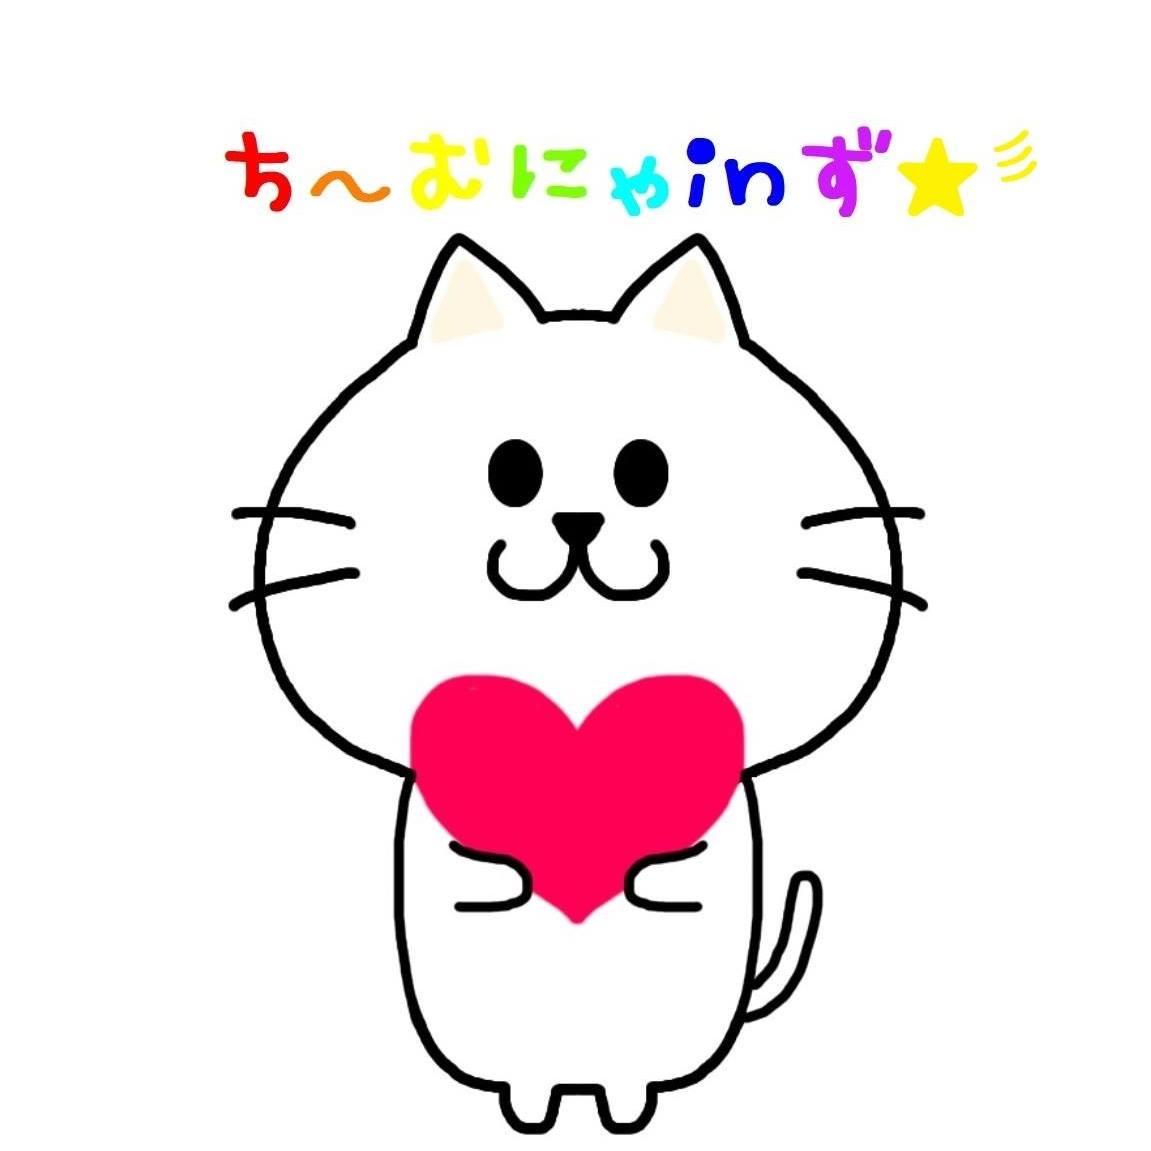 in瀬戸~猫の譲渡会 ちーむにゃいんず2021年10月16日(土)